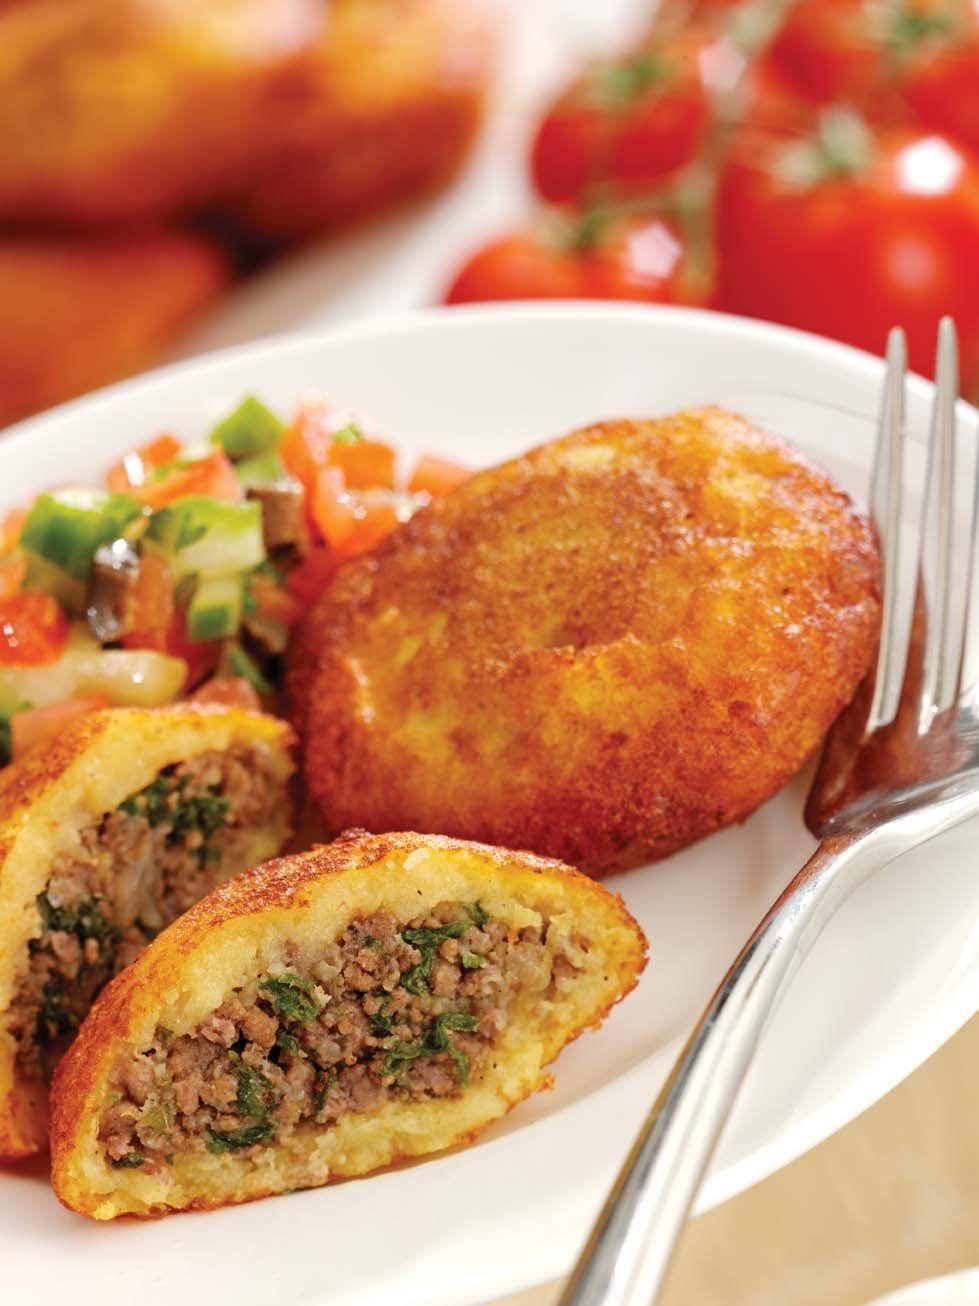 Kubbat potato iraqi cuisine potato chop favorite food in the kubbat potato iraqi cuisine potato chop favorite food in the whole wide world forumfinder Images